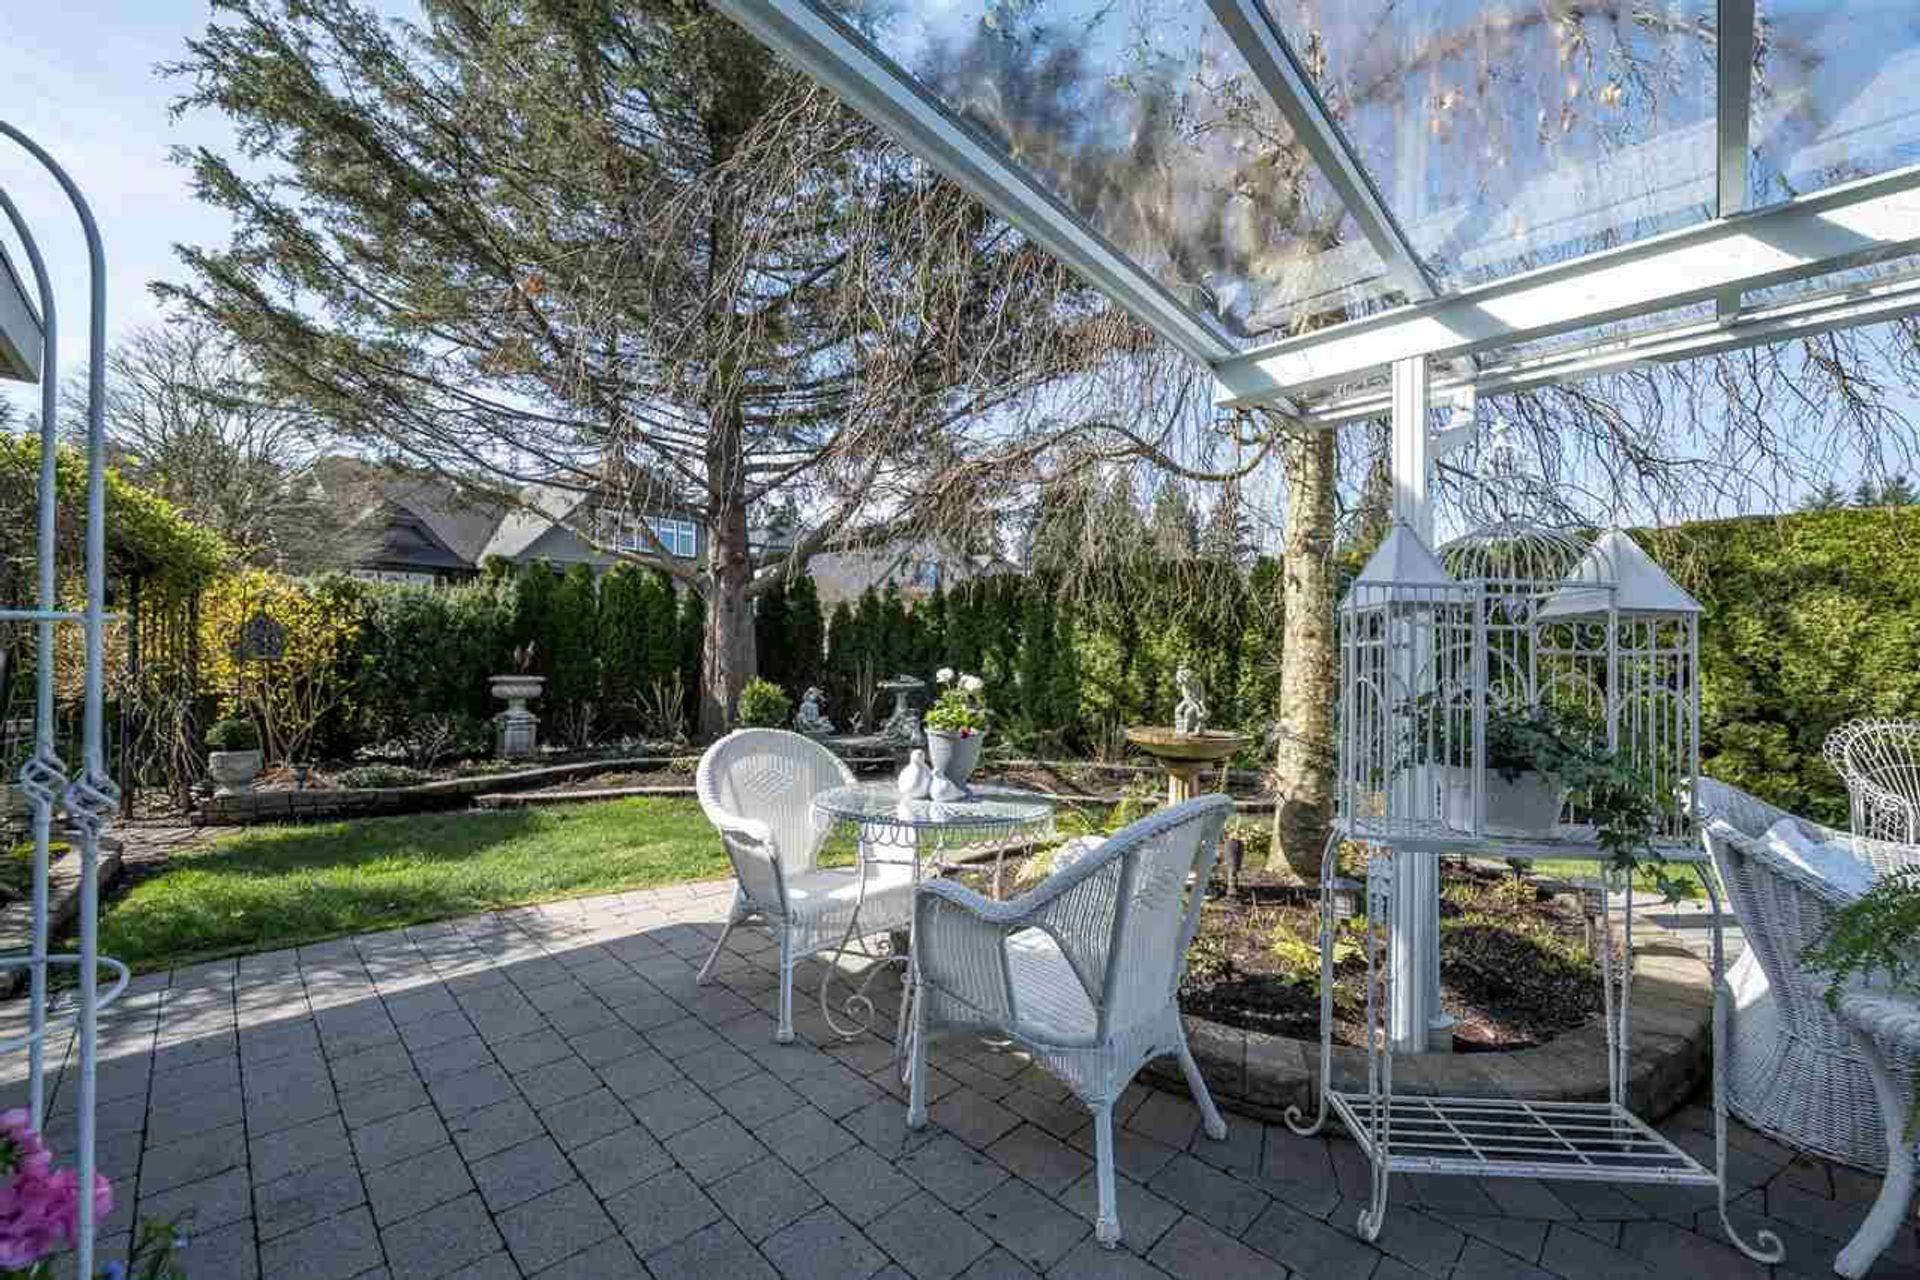 12603-215-street-west-central-maple-ridge-03 at 12603 215 Street, West Central, Maple Ridge